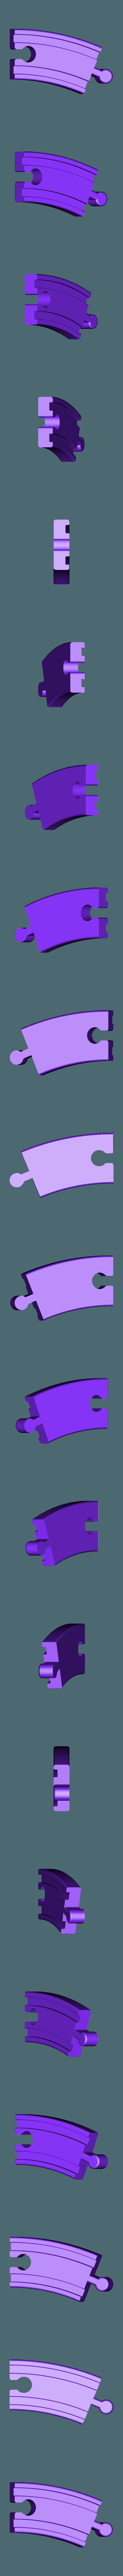 Short Right Turn Track.stl Download free STL file Toy Train Tracks • 3D printer design, FerryTeacher